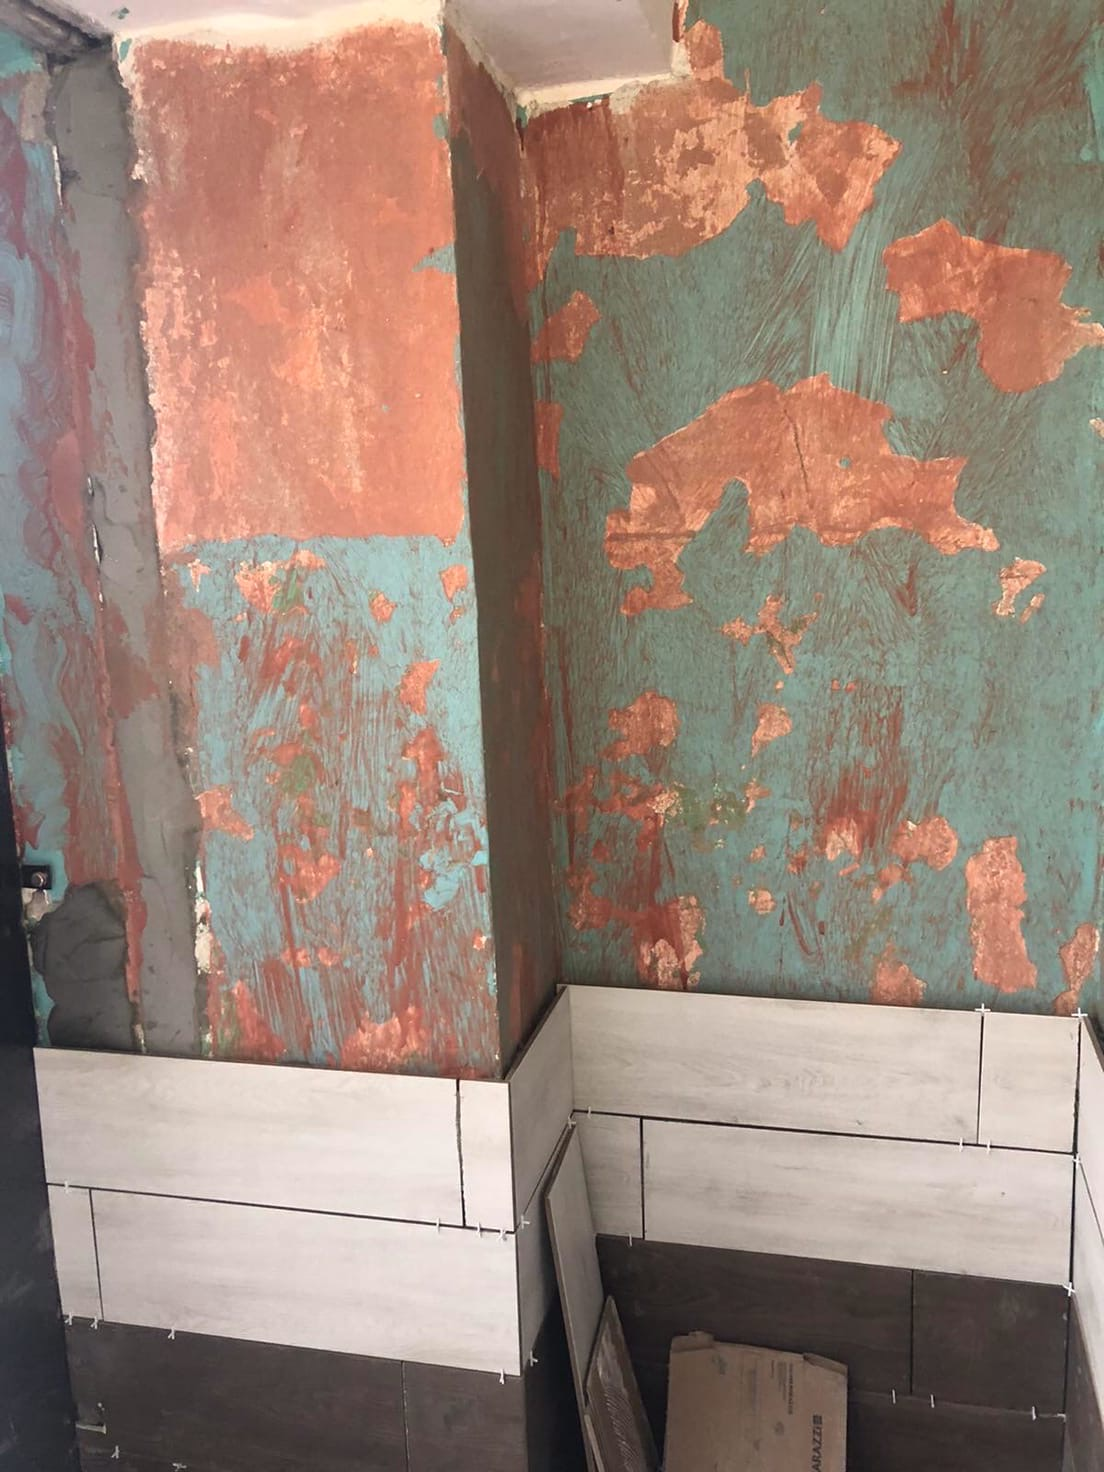 Улица Ердякова дом 16 декоративный ремонт 1